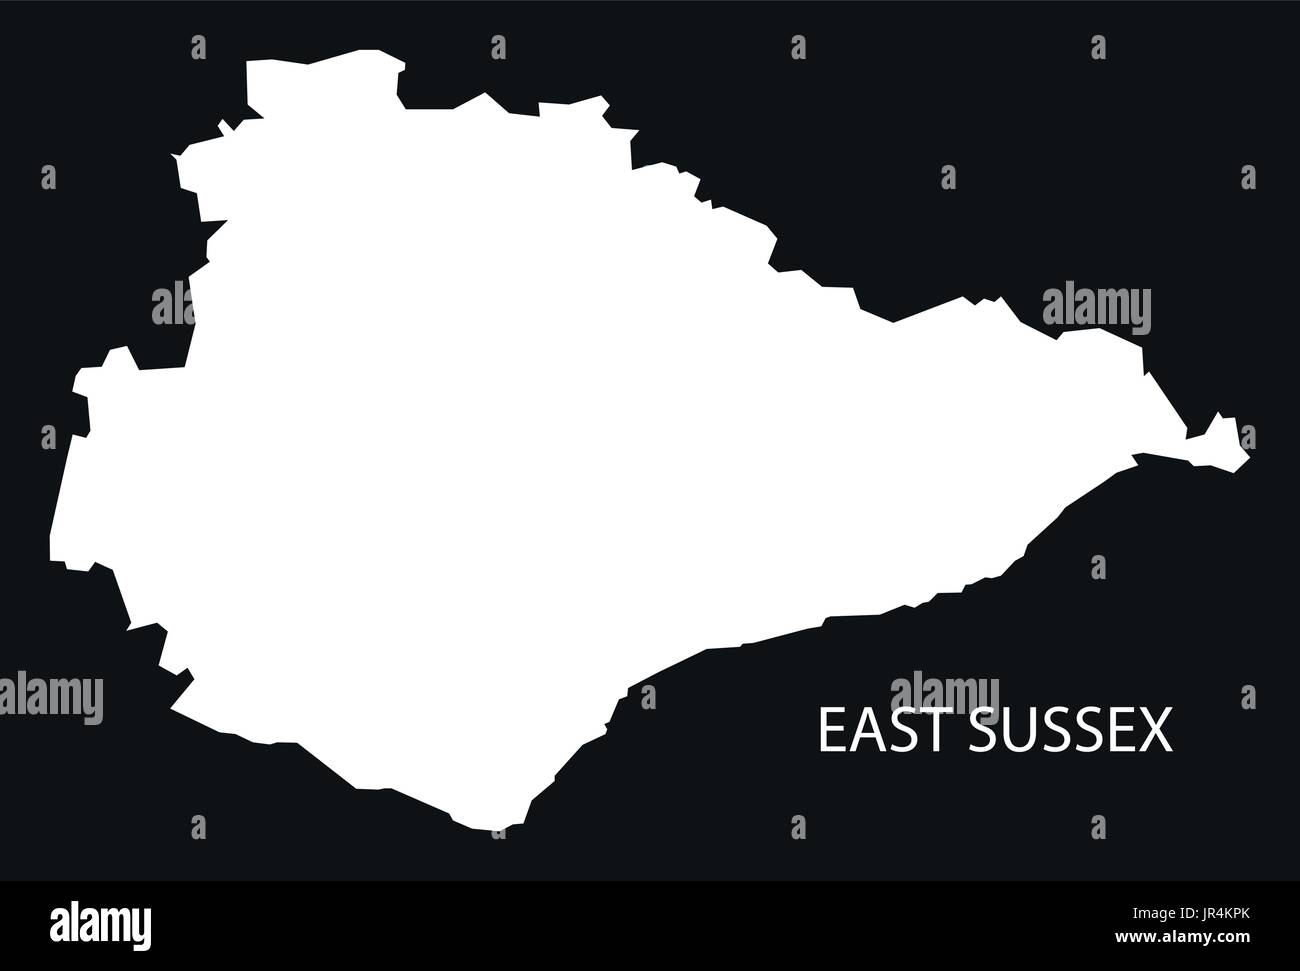 East Sussex England Uk Map Black Inverted Silhouette Illustration